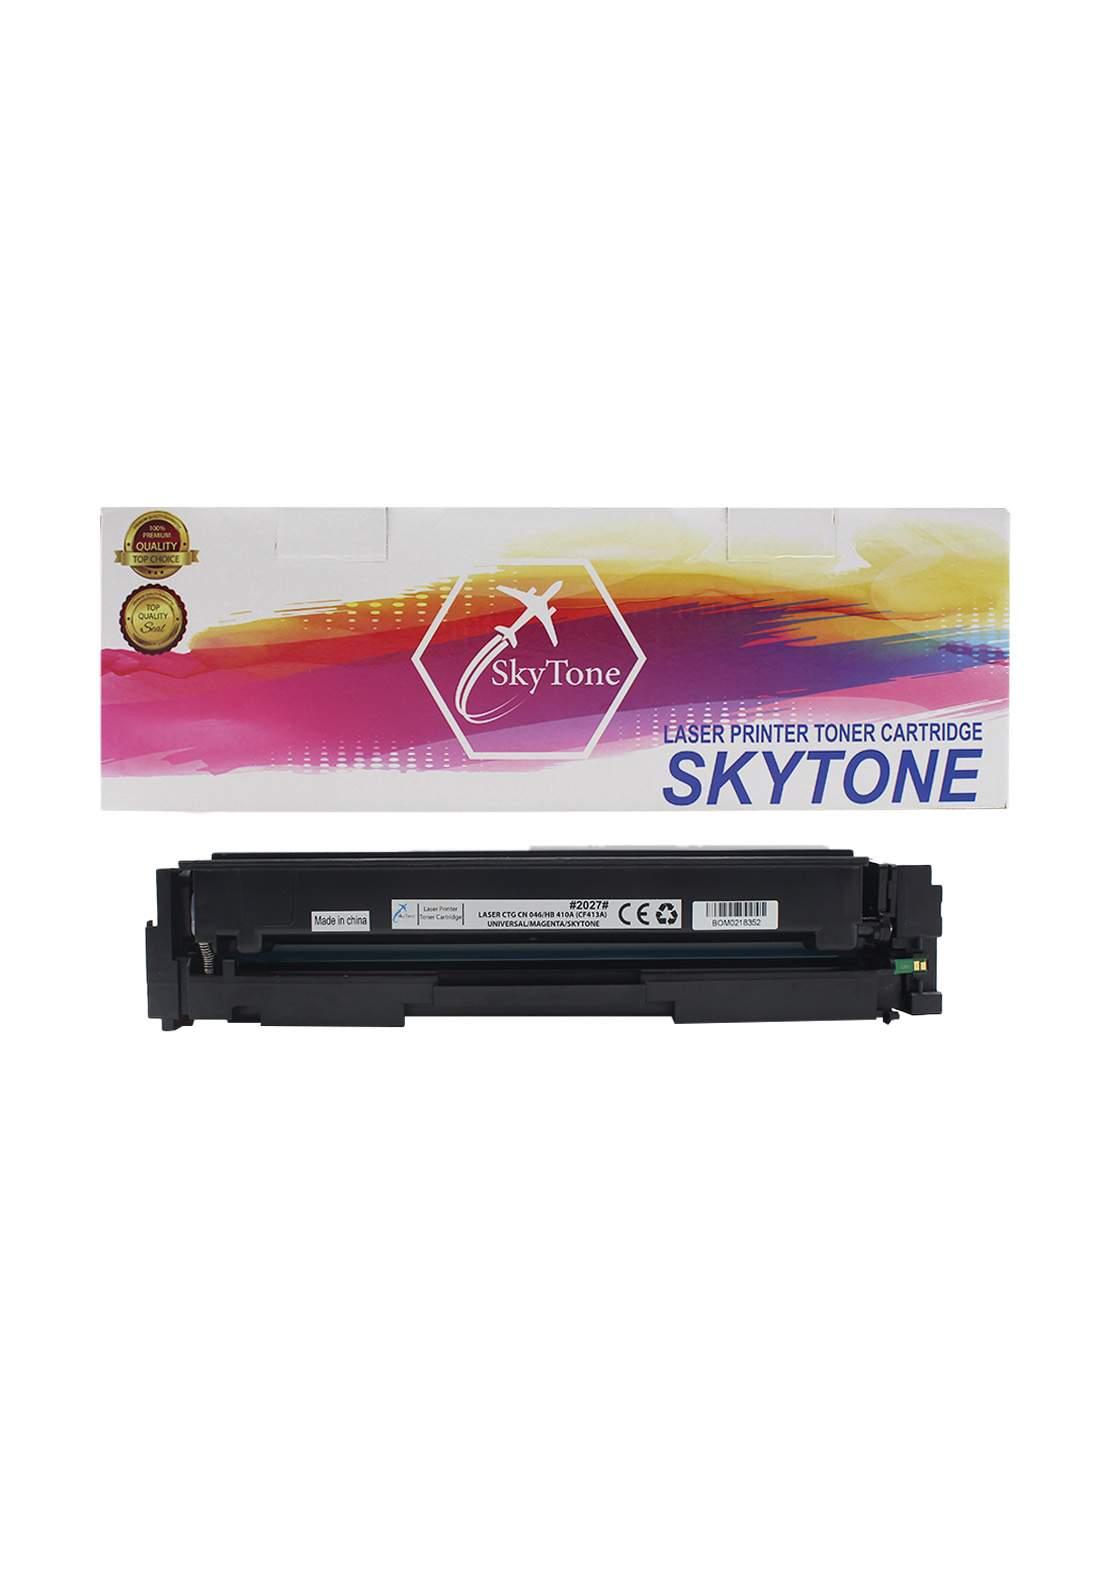 SKYTONE CTG Canon 046/HP 410A (CF413A) Universal Laser Printer Toner Cartridge خرطوشة حبر